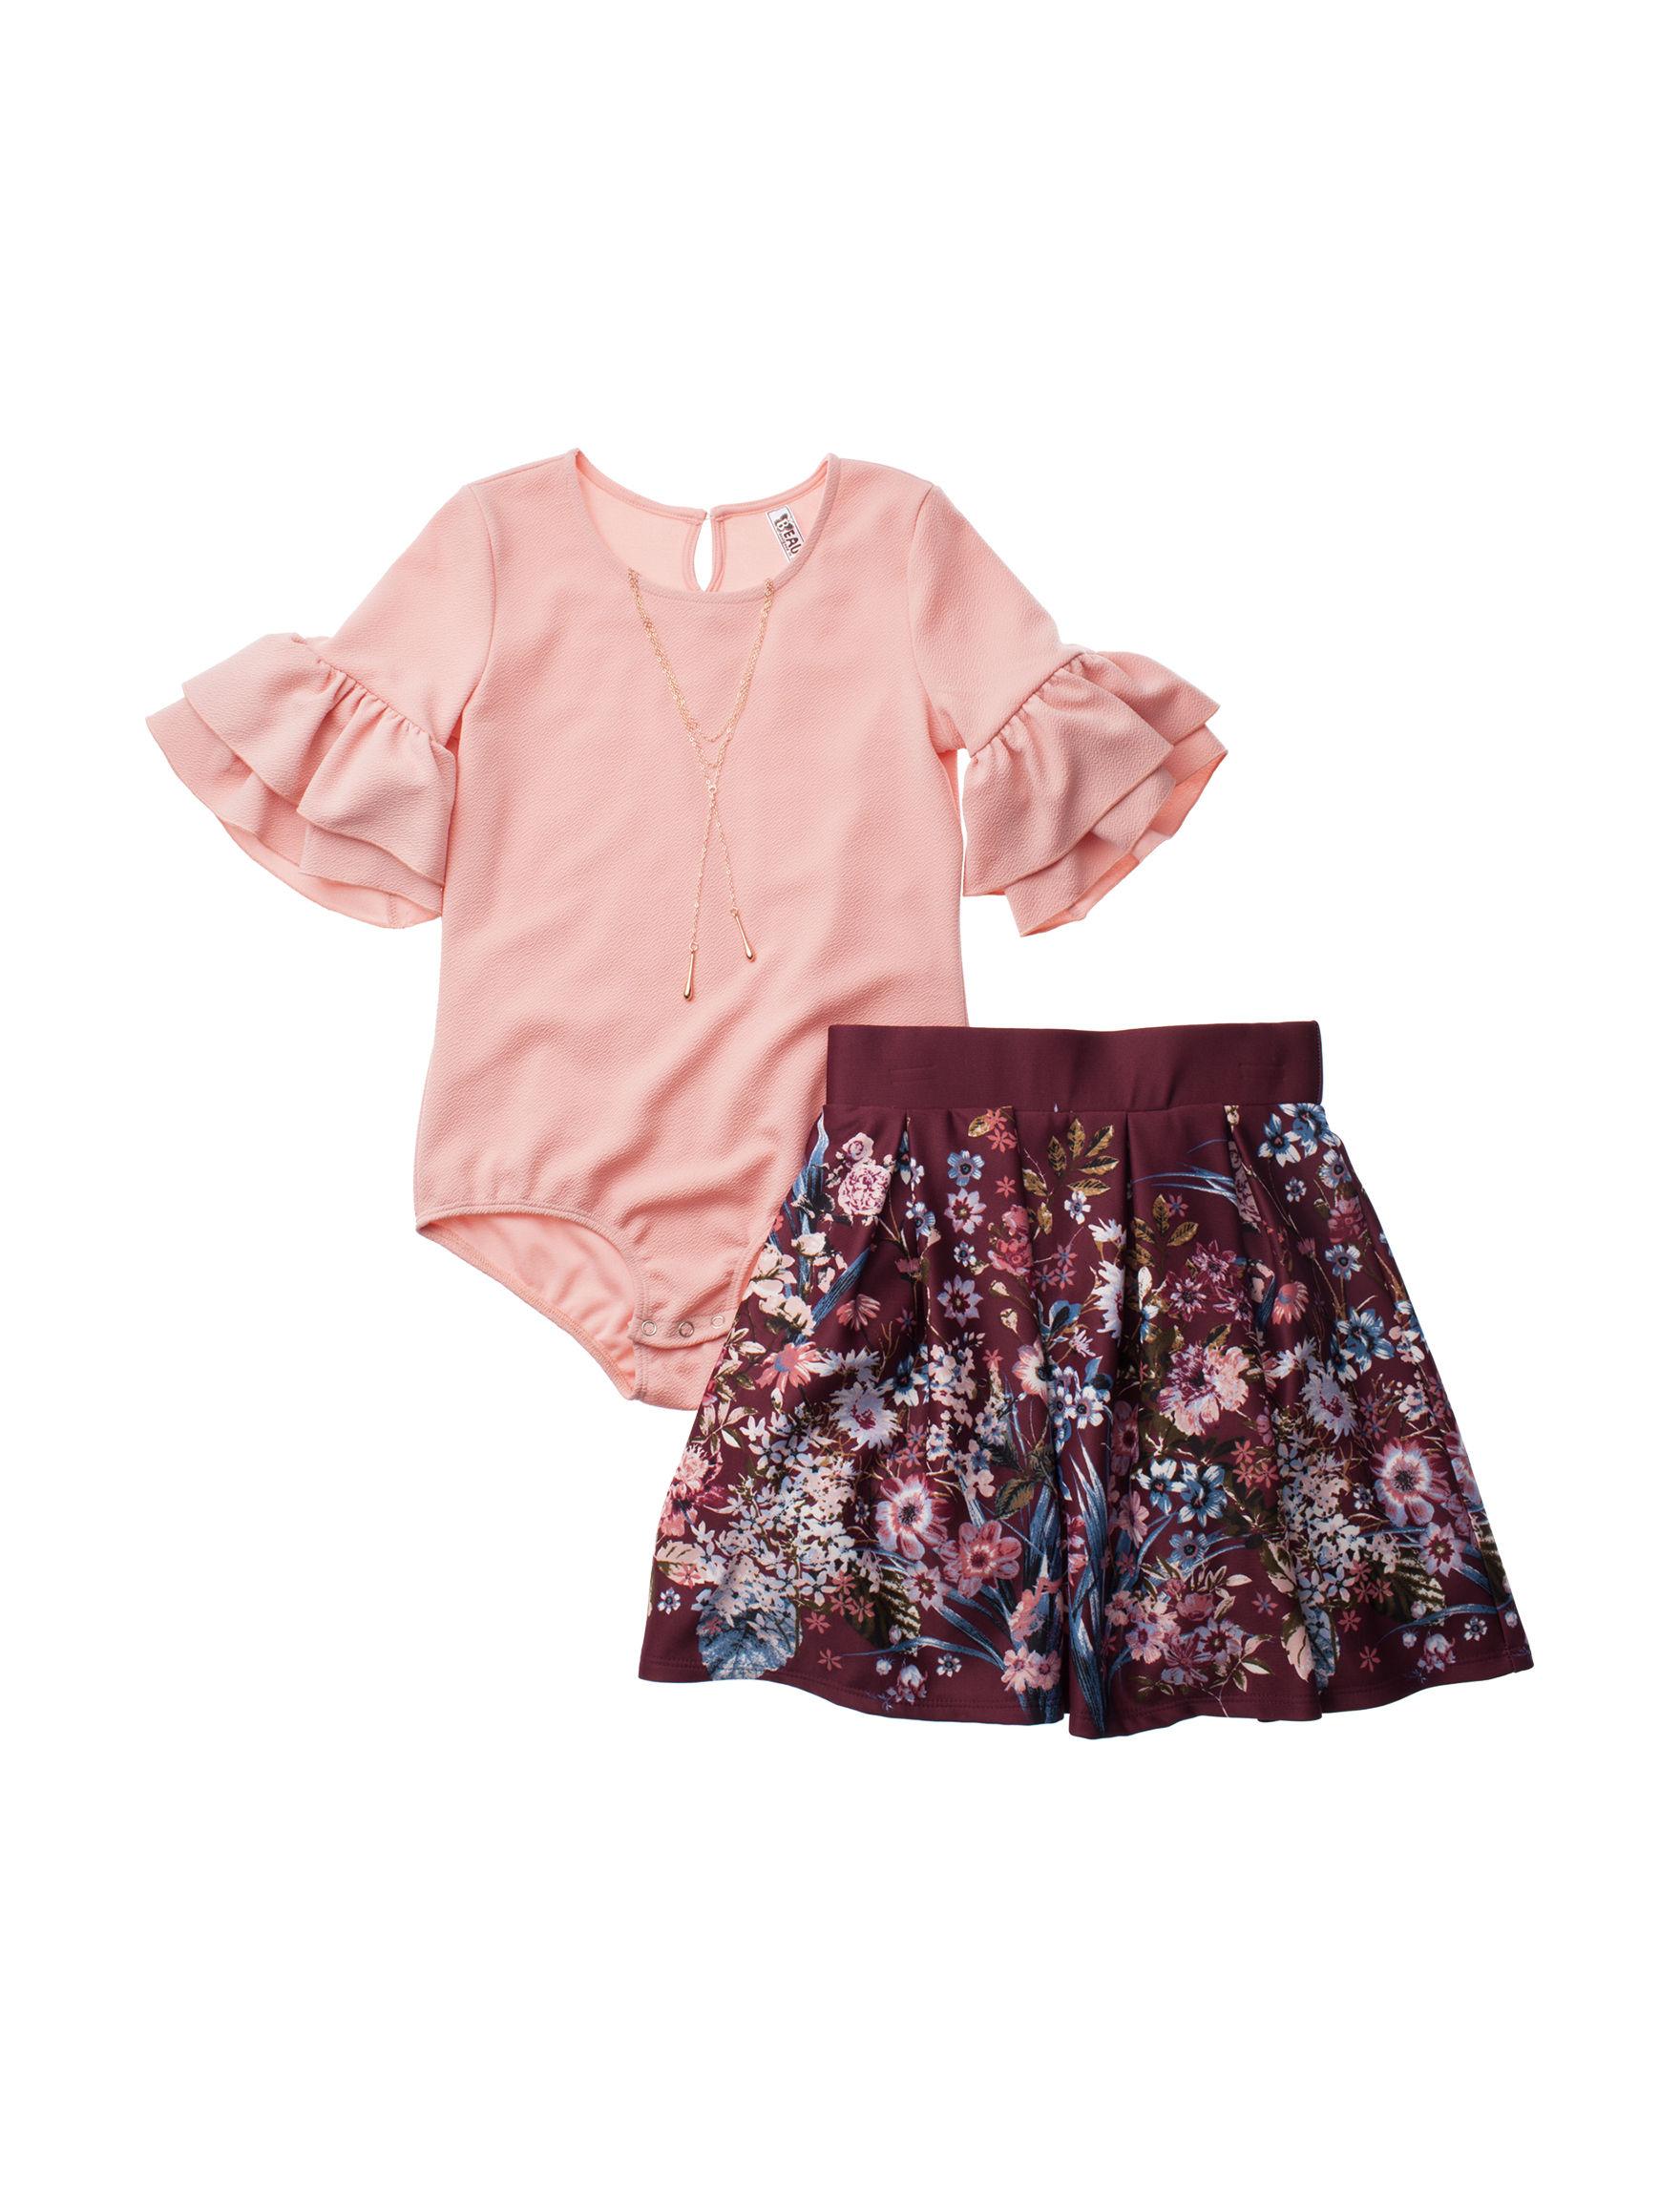 Beautees Pink / Burgundy